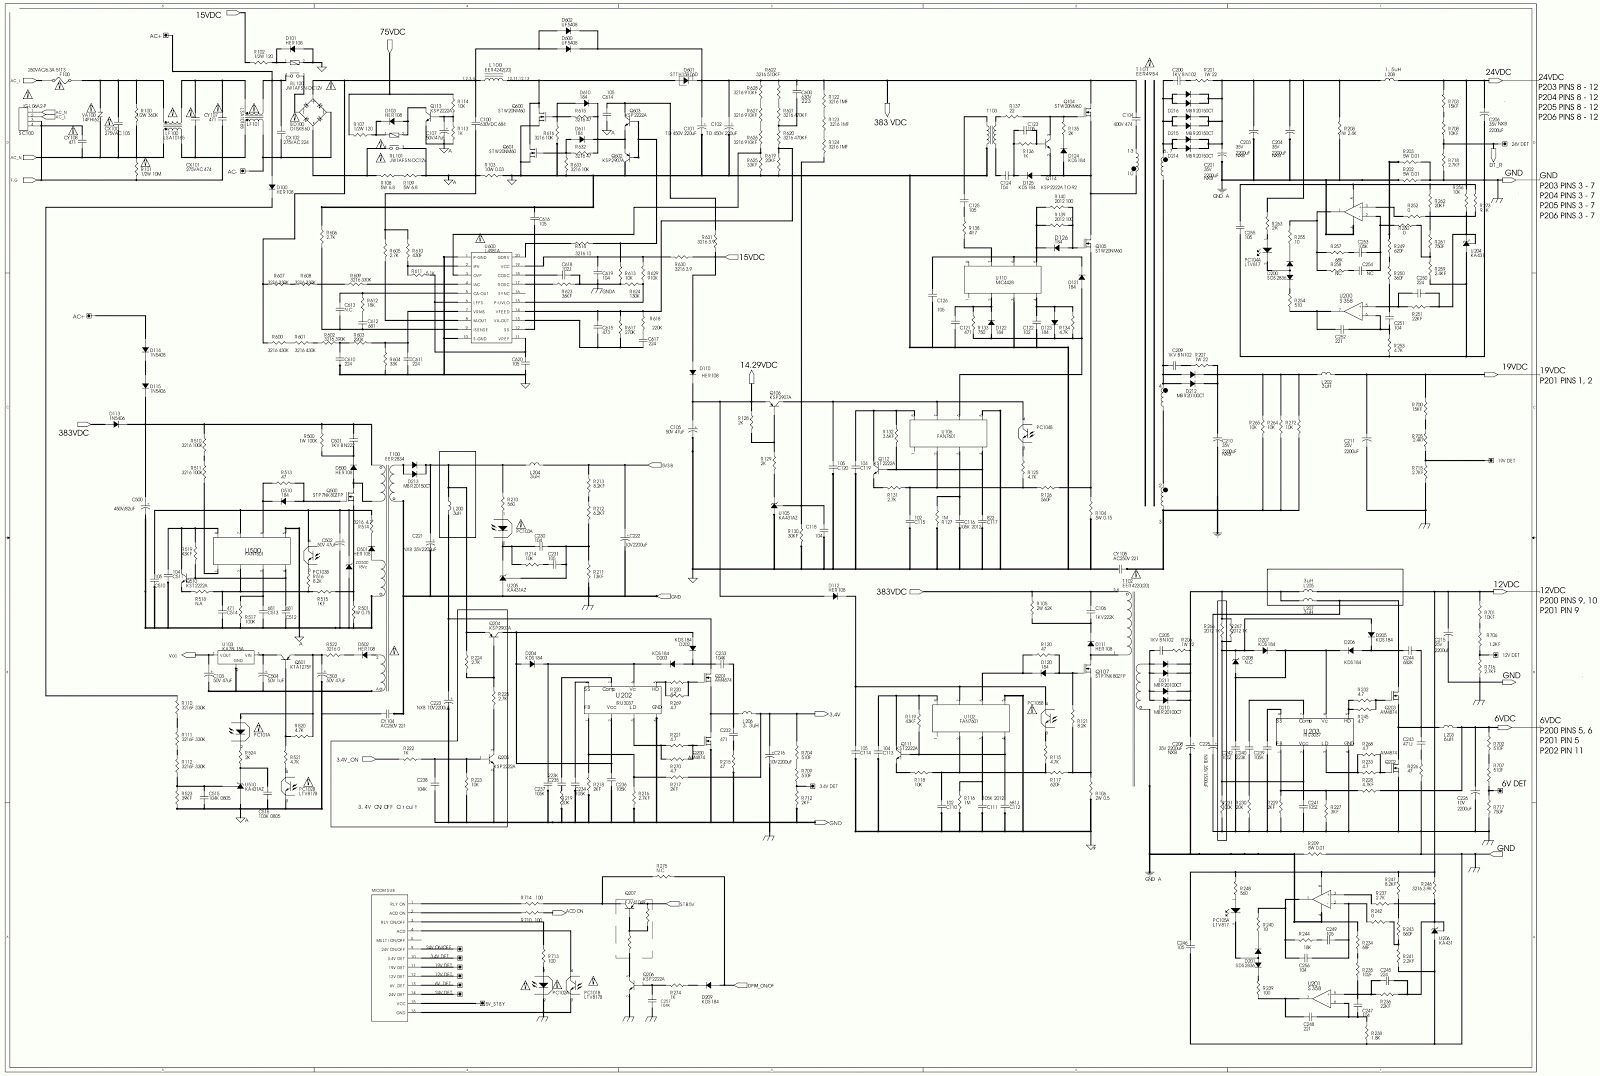 hight resolution of vizio tv wiring diagram wiring diagram ebookvizio tv wiring diagram wiring diagrams lolvizio tv wiring diagram